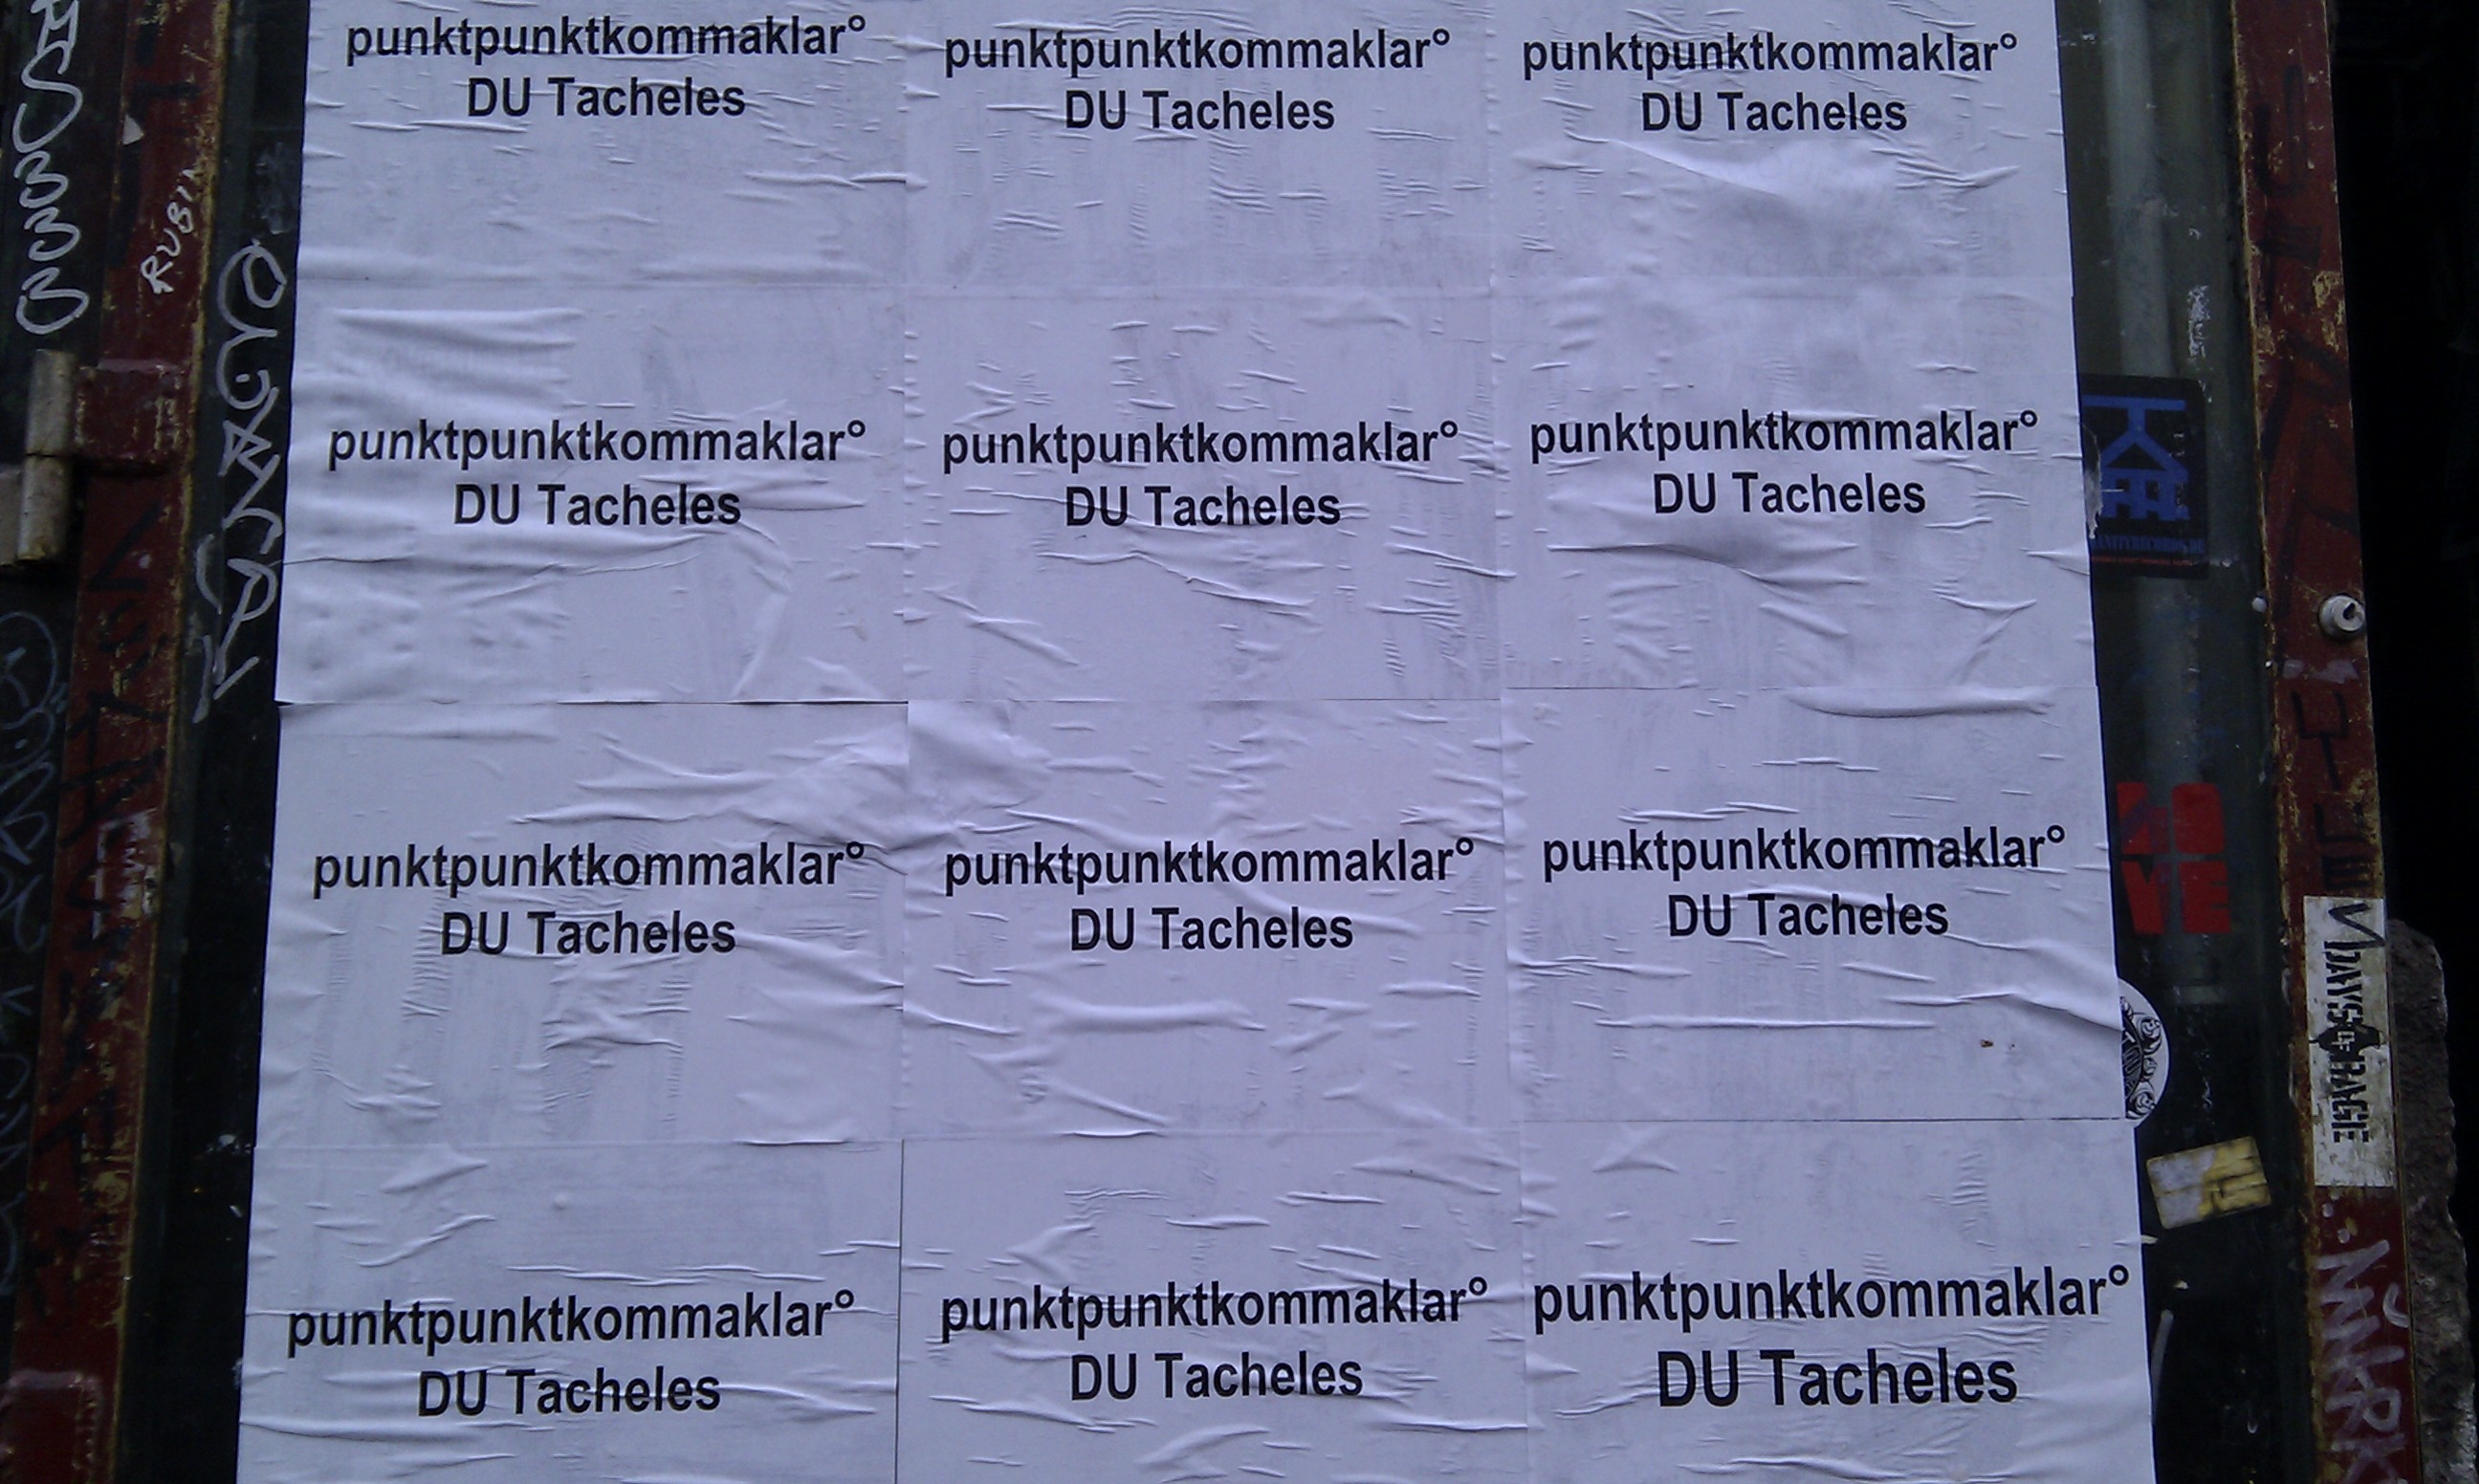 Tacheles, Oranienburger Straße, 2011-01-22